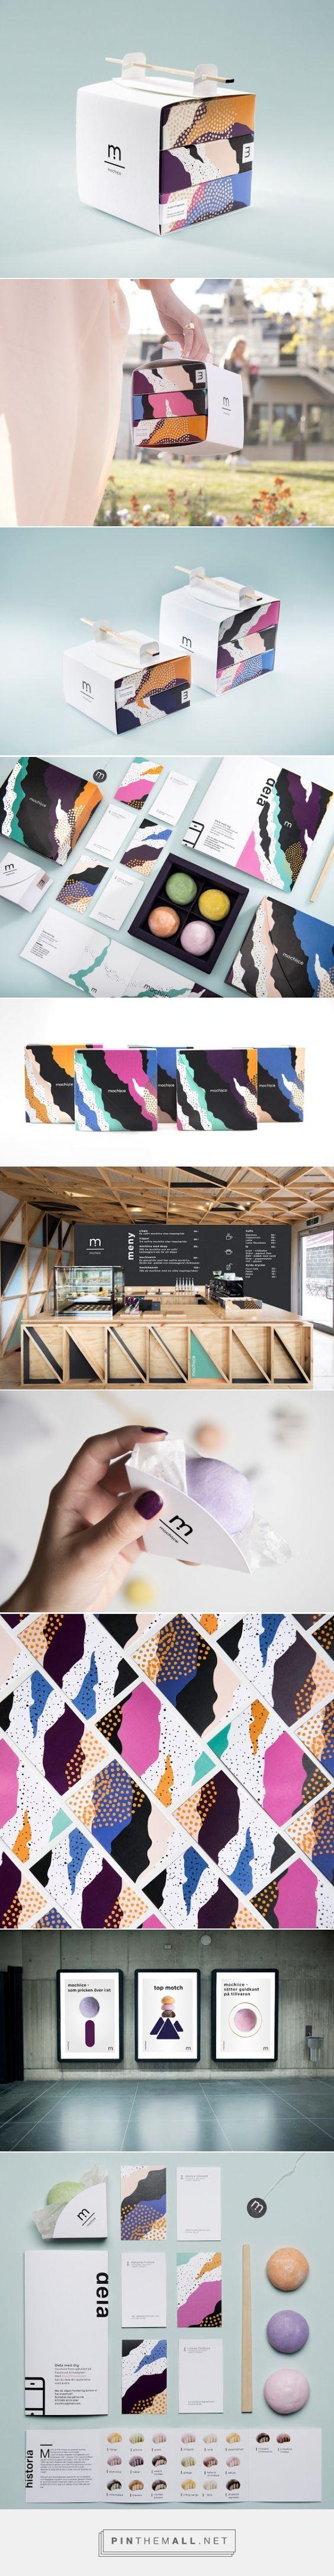 Mochiice Branding by Natasha Frolova | Fivestar Branding – Design and Branding Agency & Inspiration Gallery